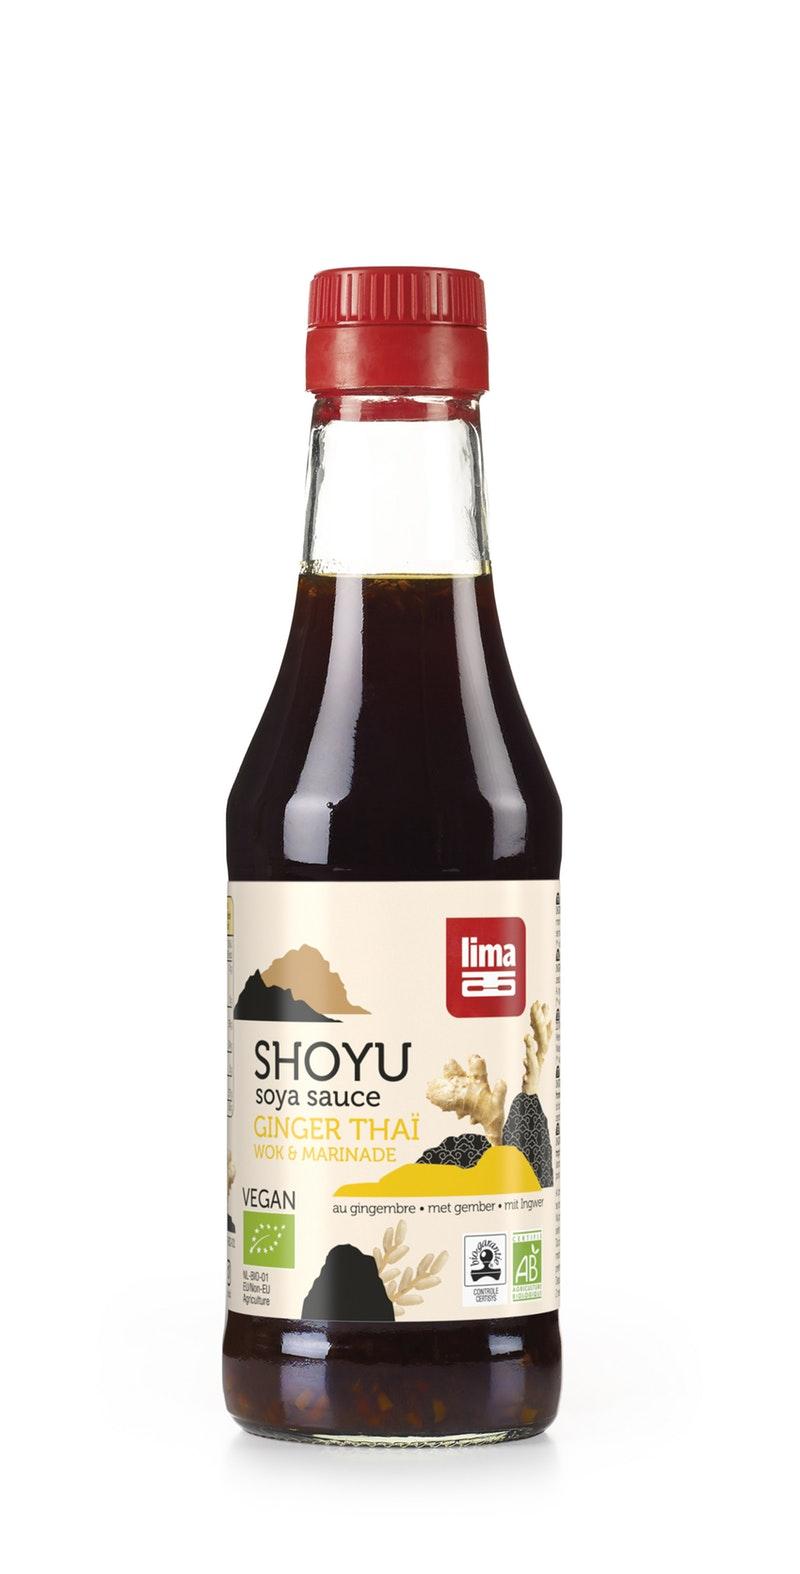 Shoyu ginger thaï BIO pour wok & grillades, Lima (250 ml)